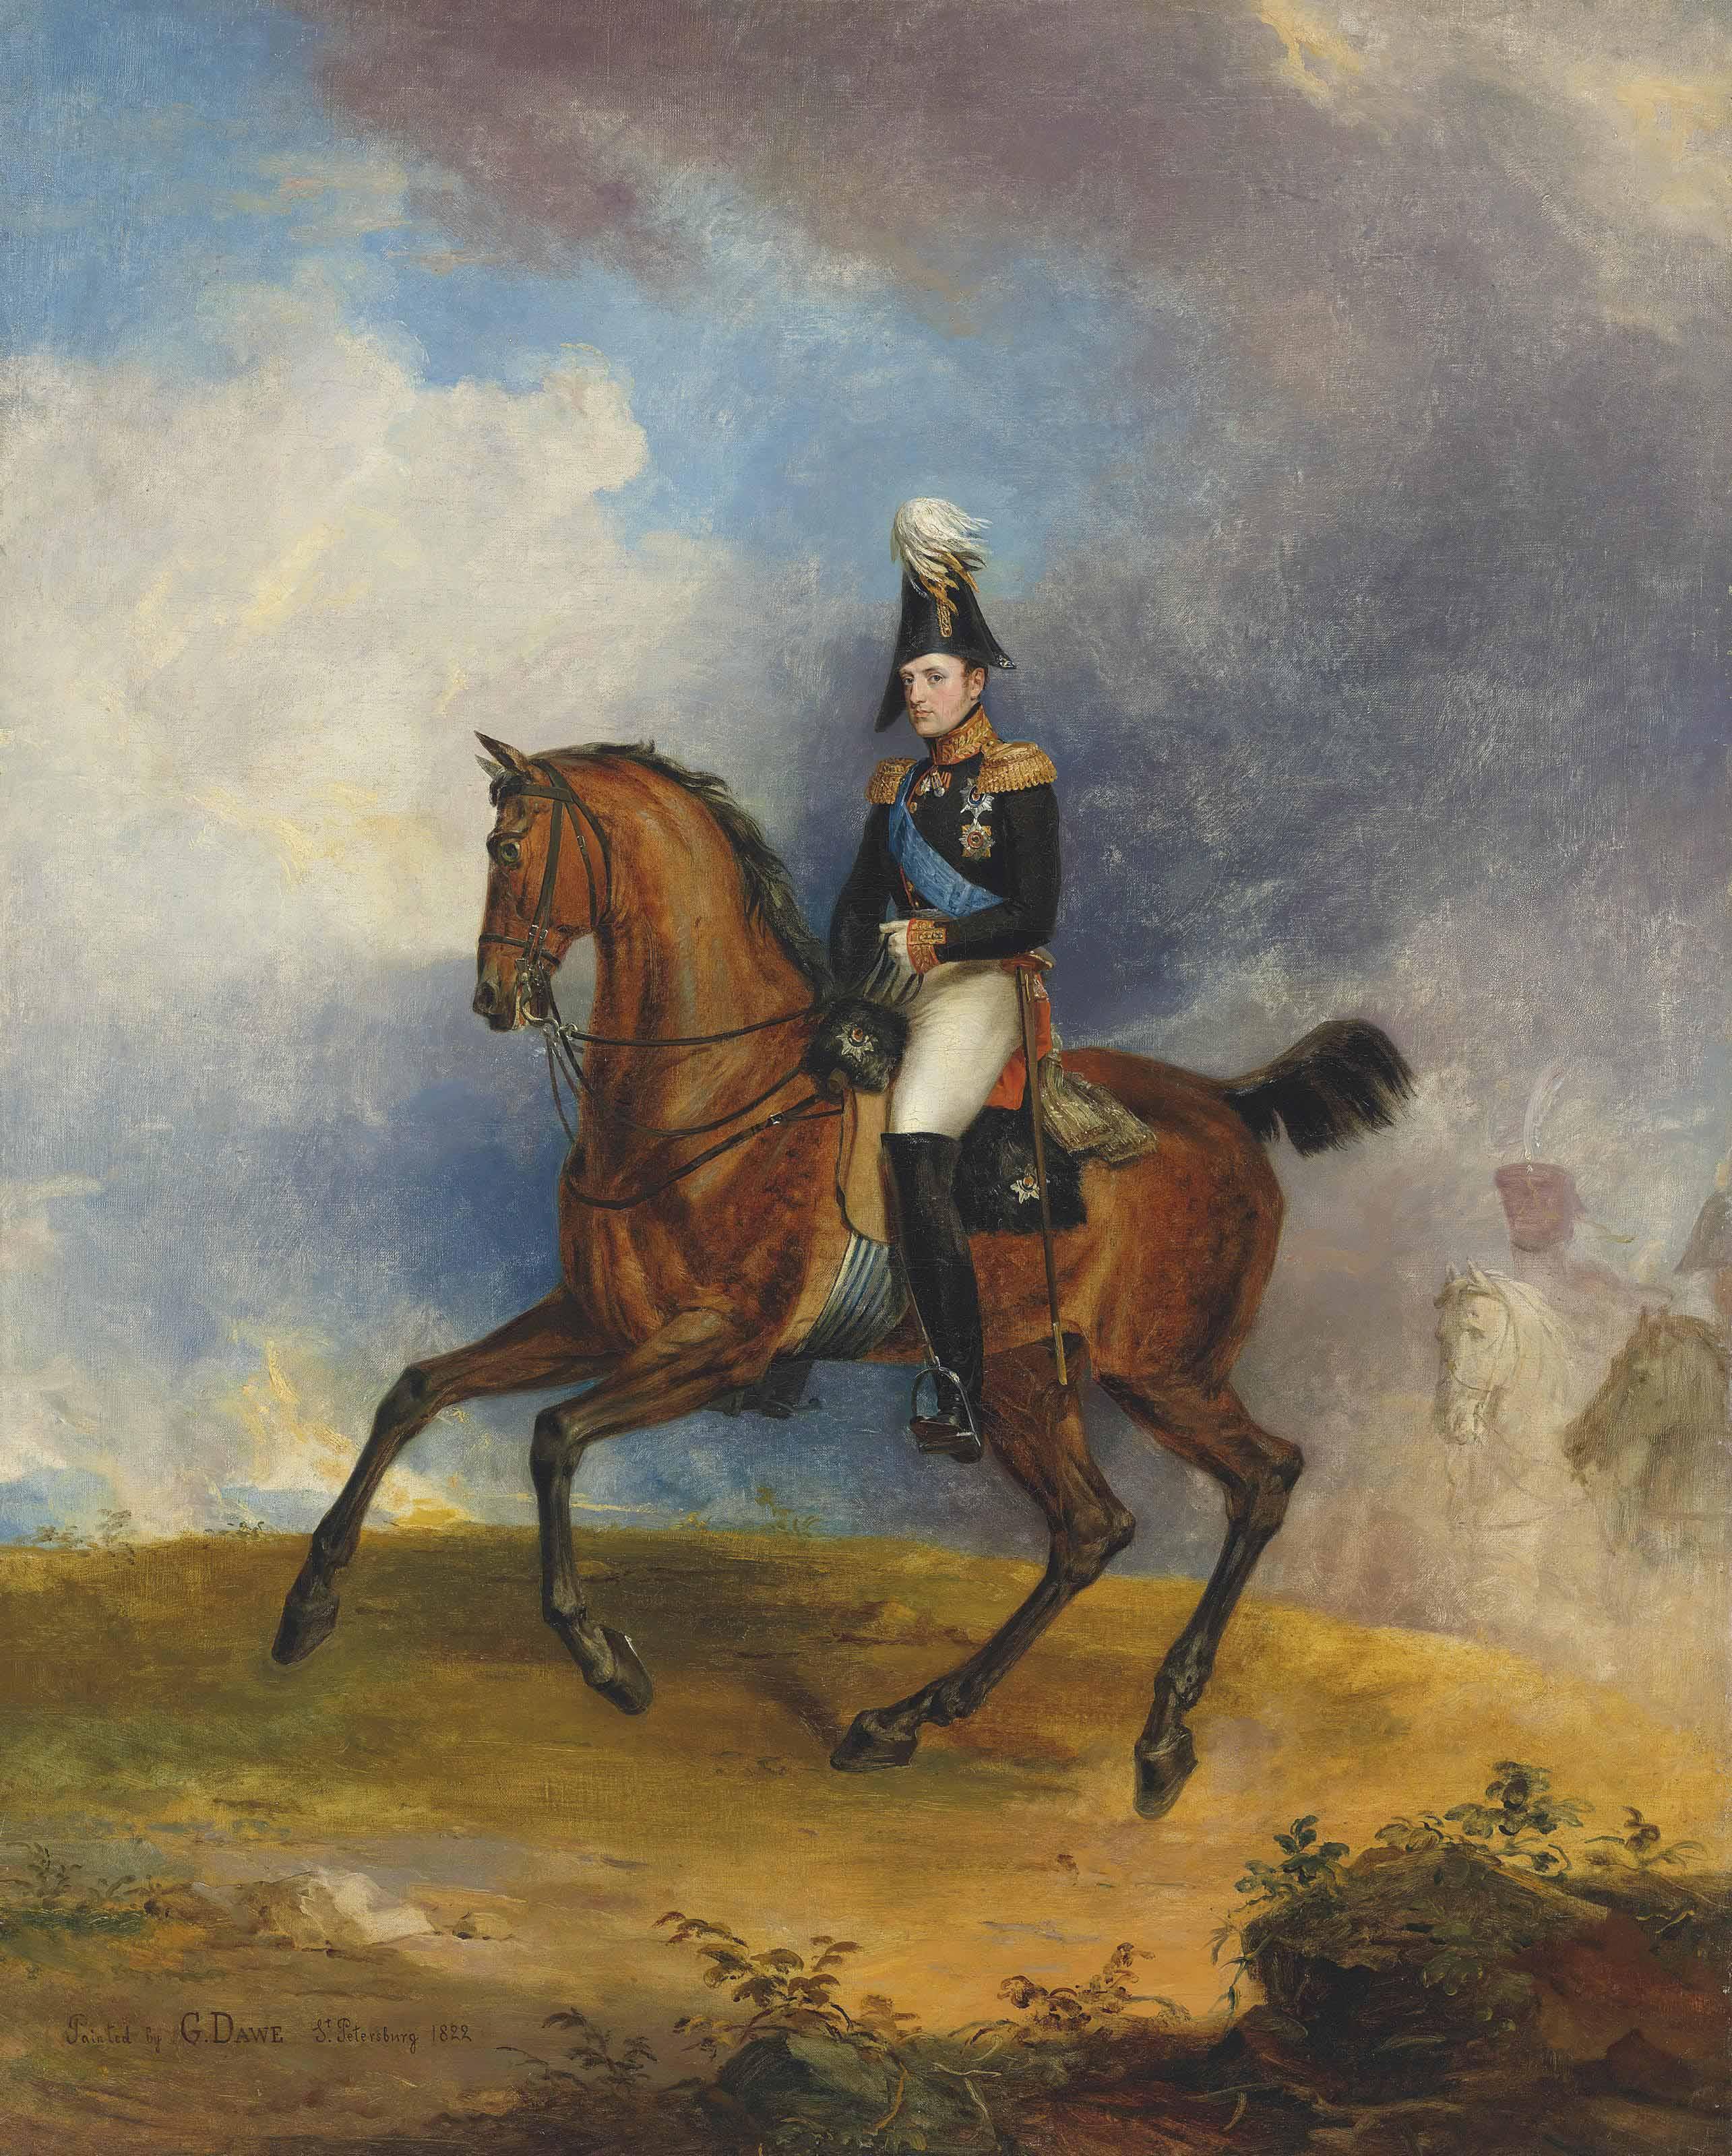 Portrait of Grand Duke Nicholas, later Emperor Nicholas I (1825-55), on horseback